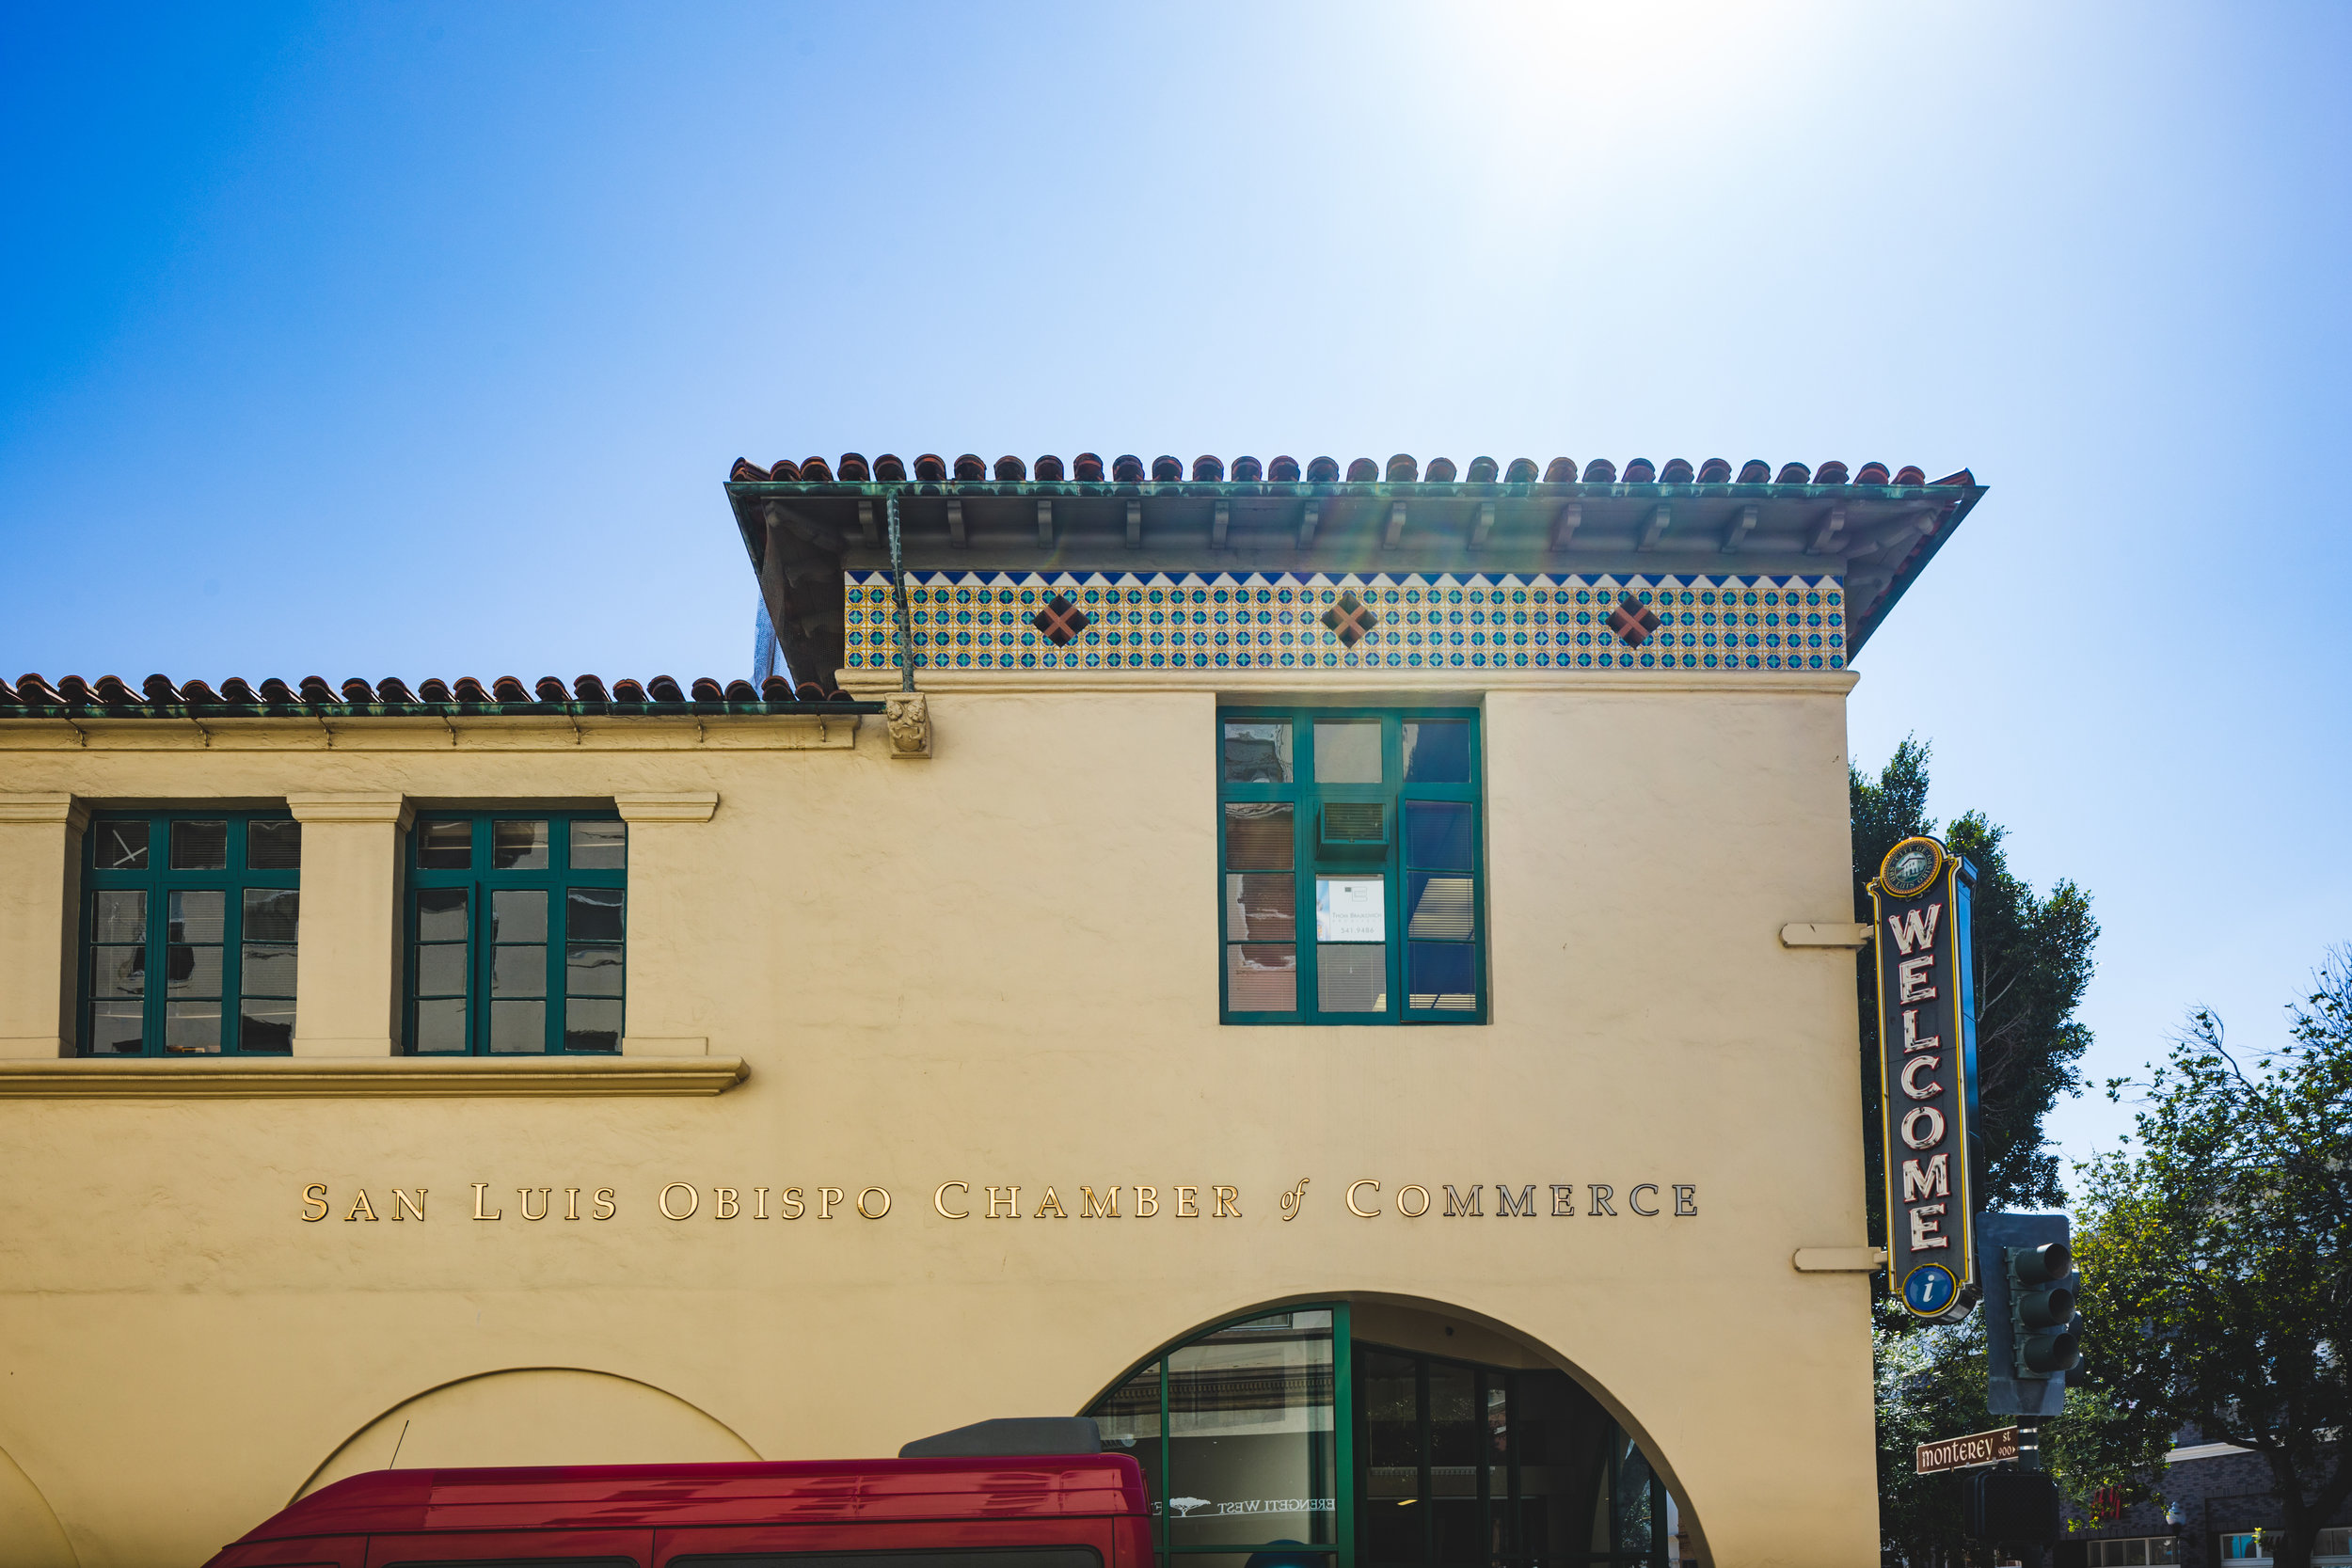 SLO CHAMBER OF COMMERCE - SAN LUIS OBISPO, CA